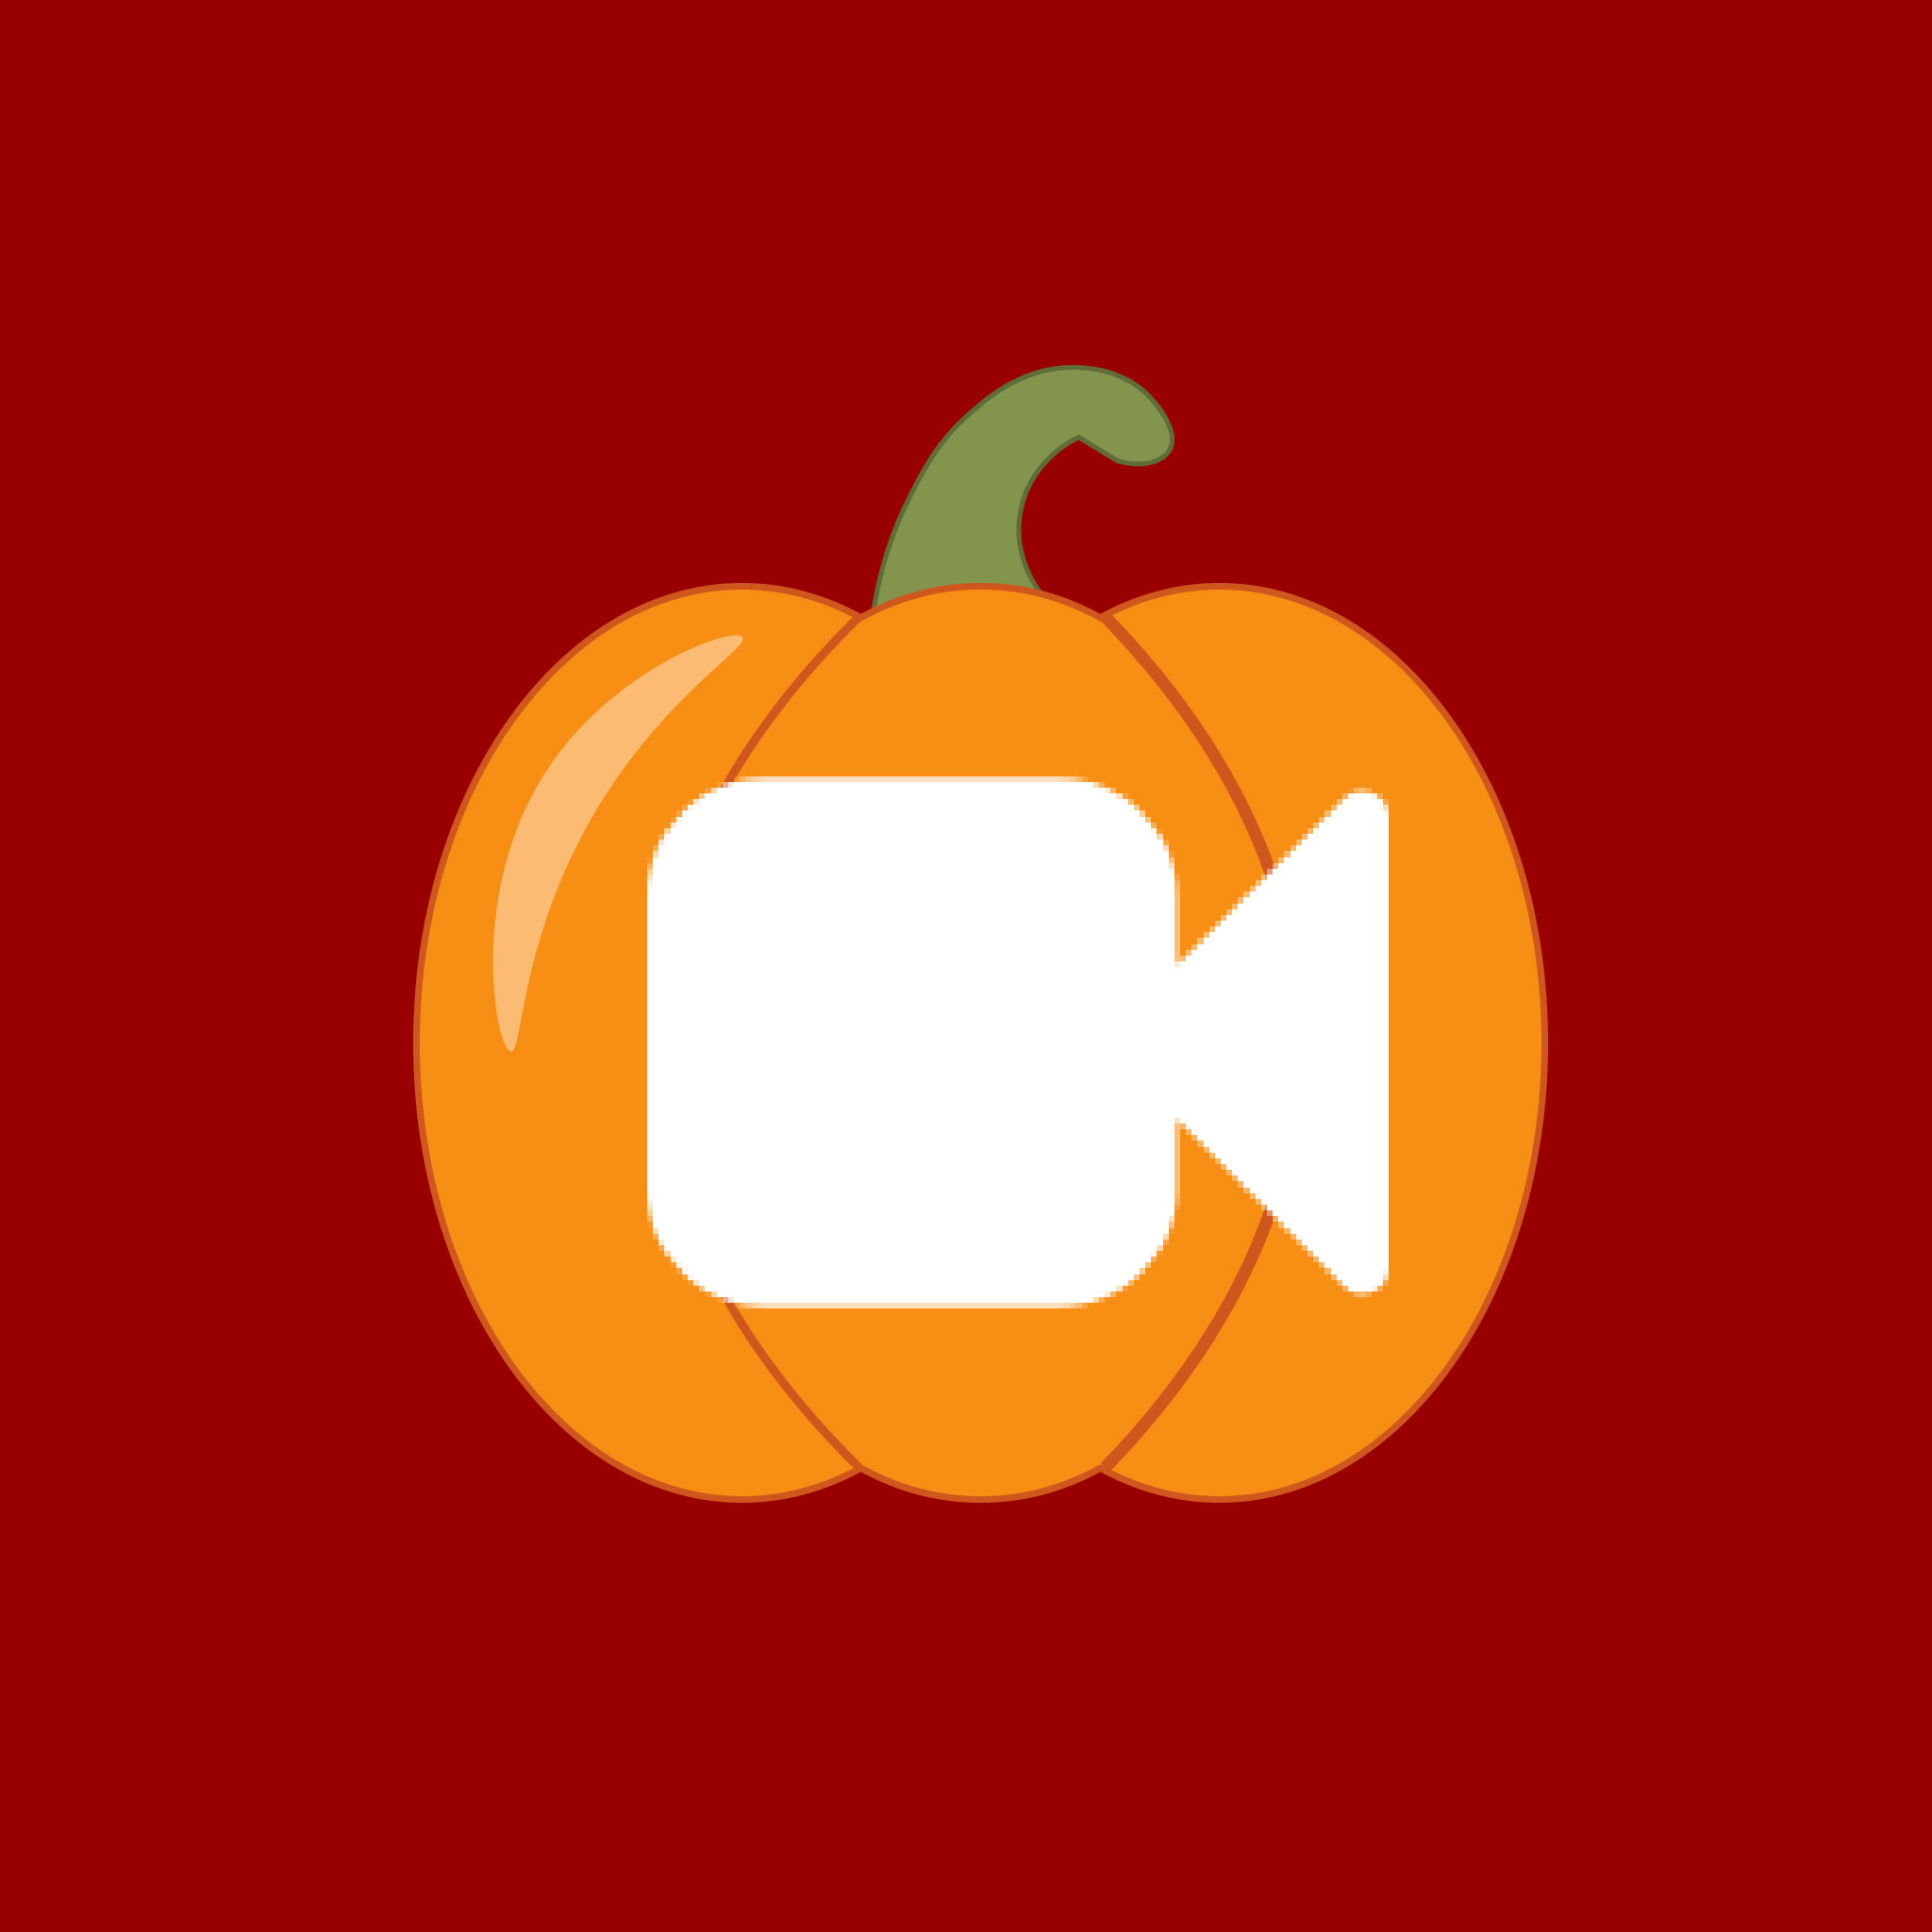 Facetime Halloween App Icon from HalloweenCostumes.com